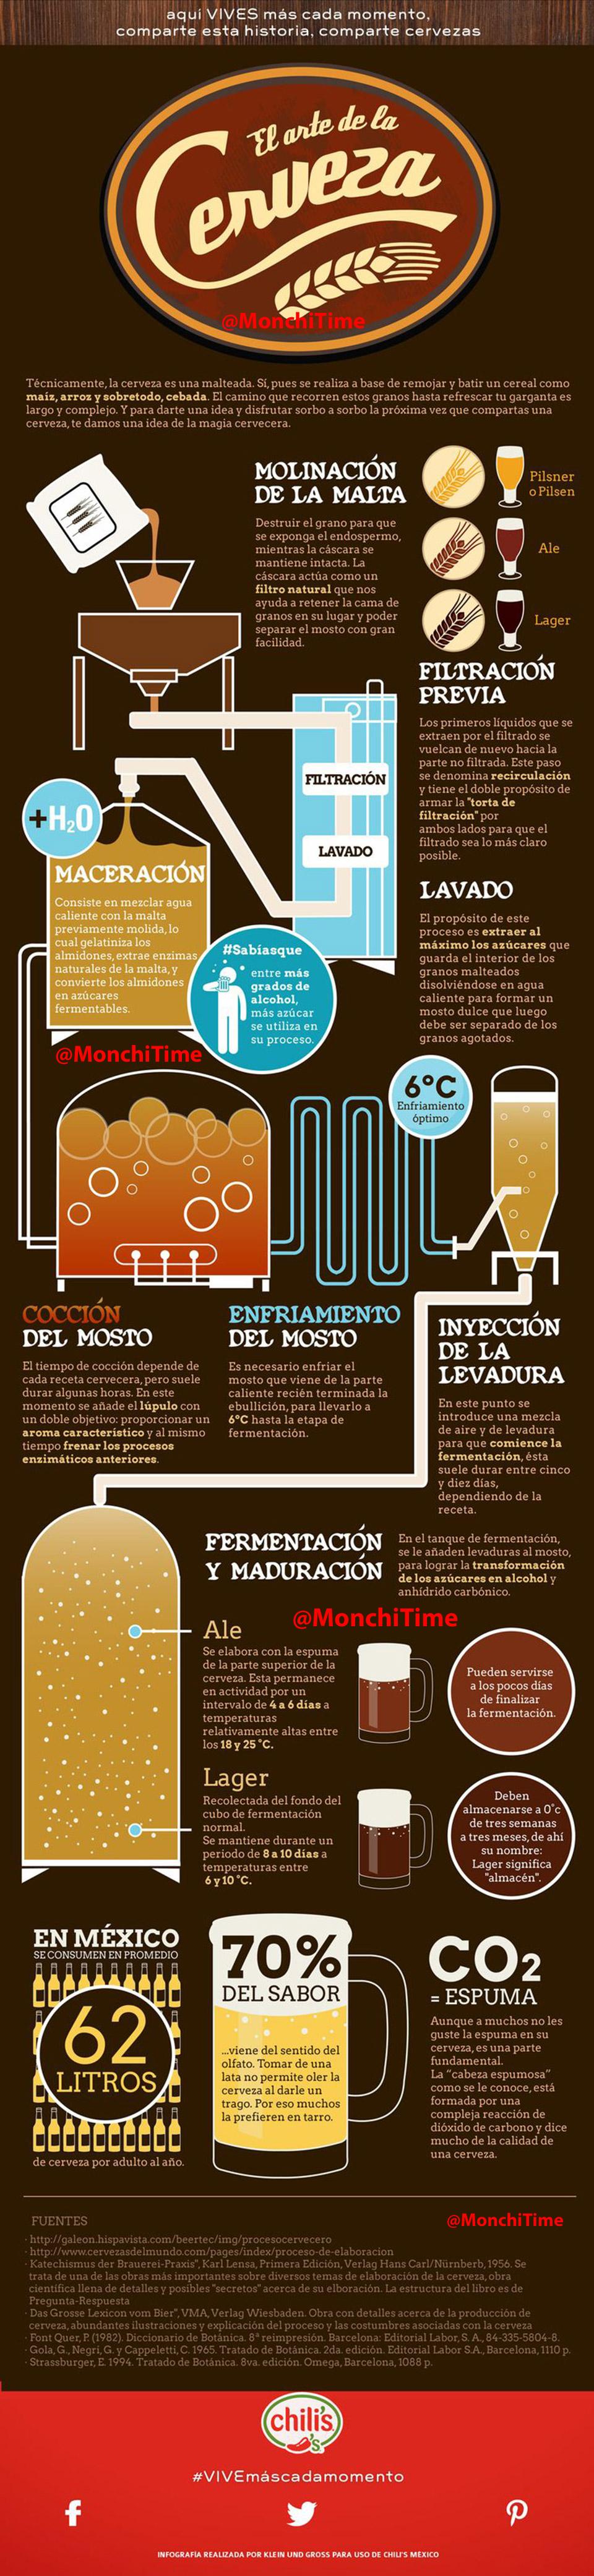 Infografía_Cerveza copy